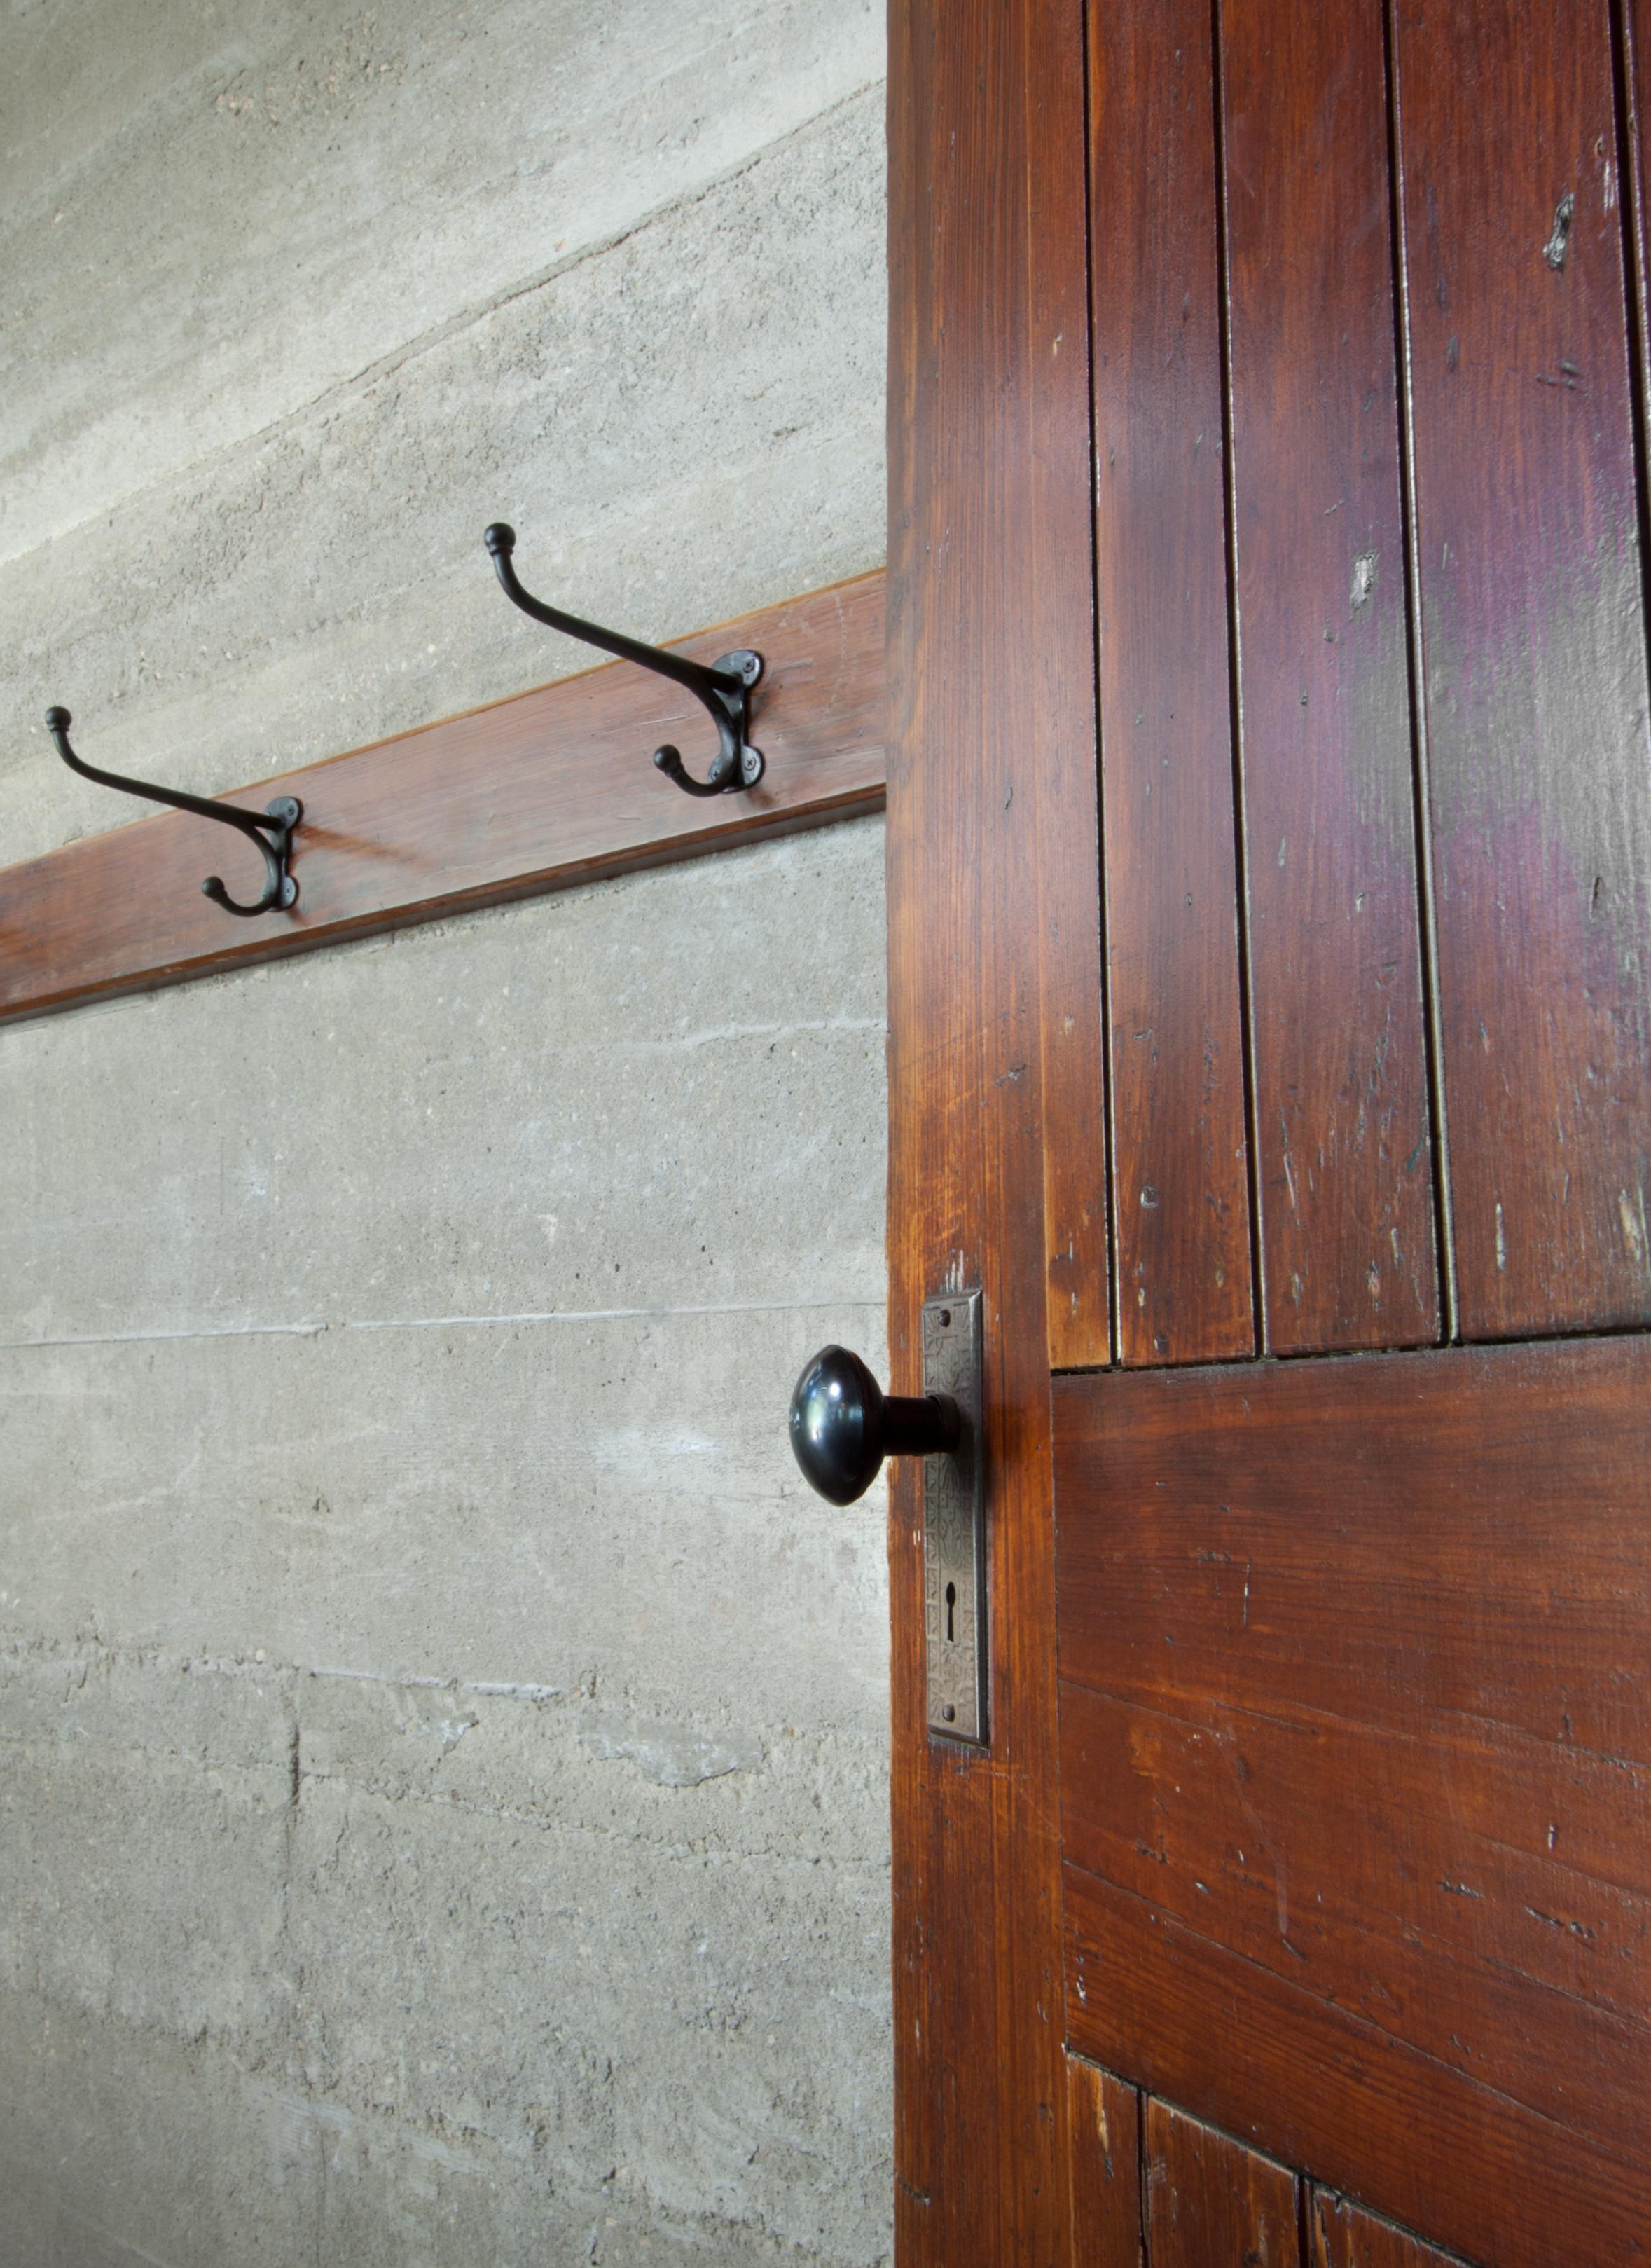 09-Colombiere-detail.jpg